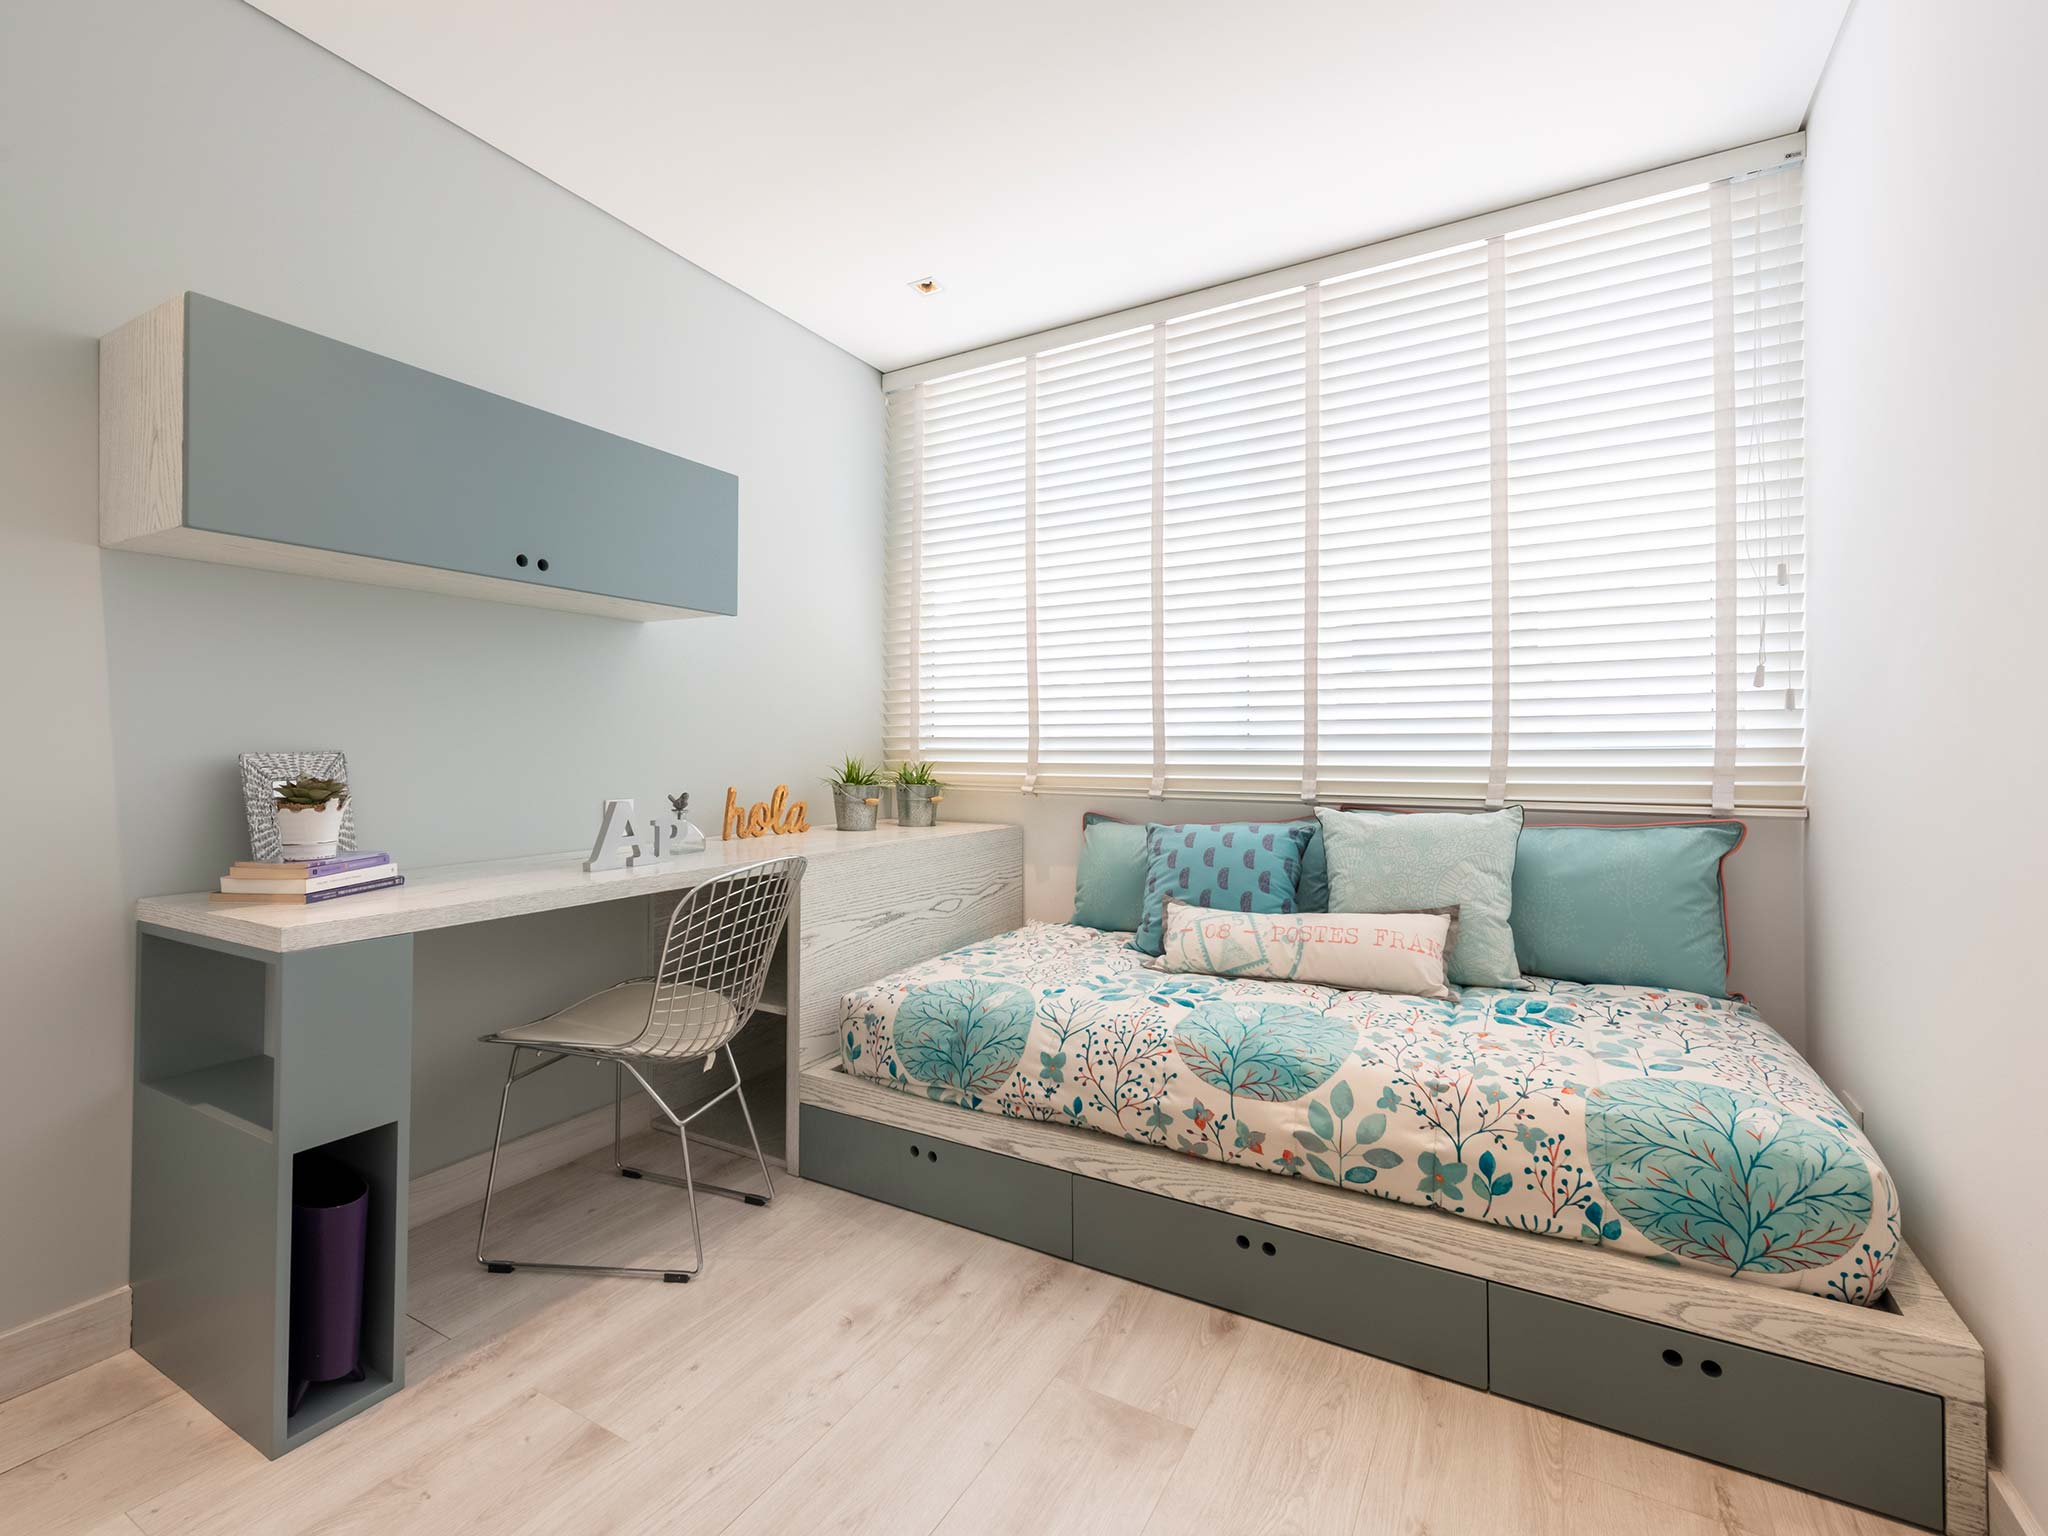 Apartamentos en Envigado - Nativo Arena - Apartamento modelo